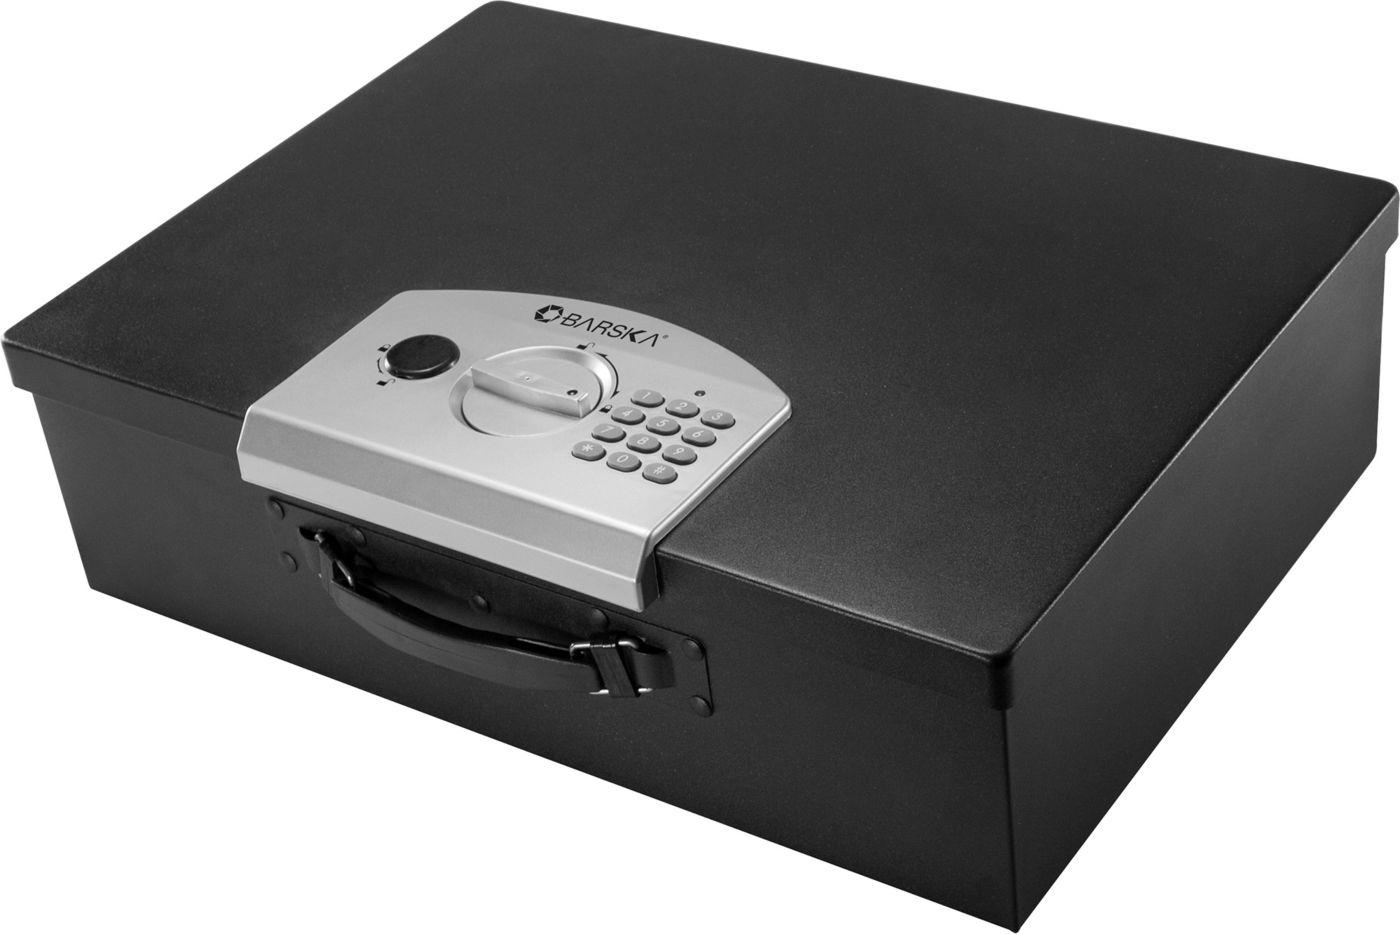 Barska Portable Keypad Safe with Digital Lock